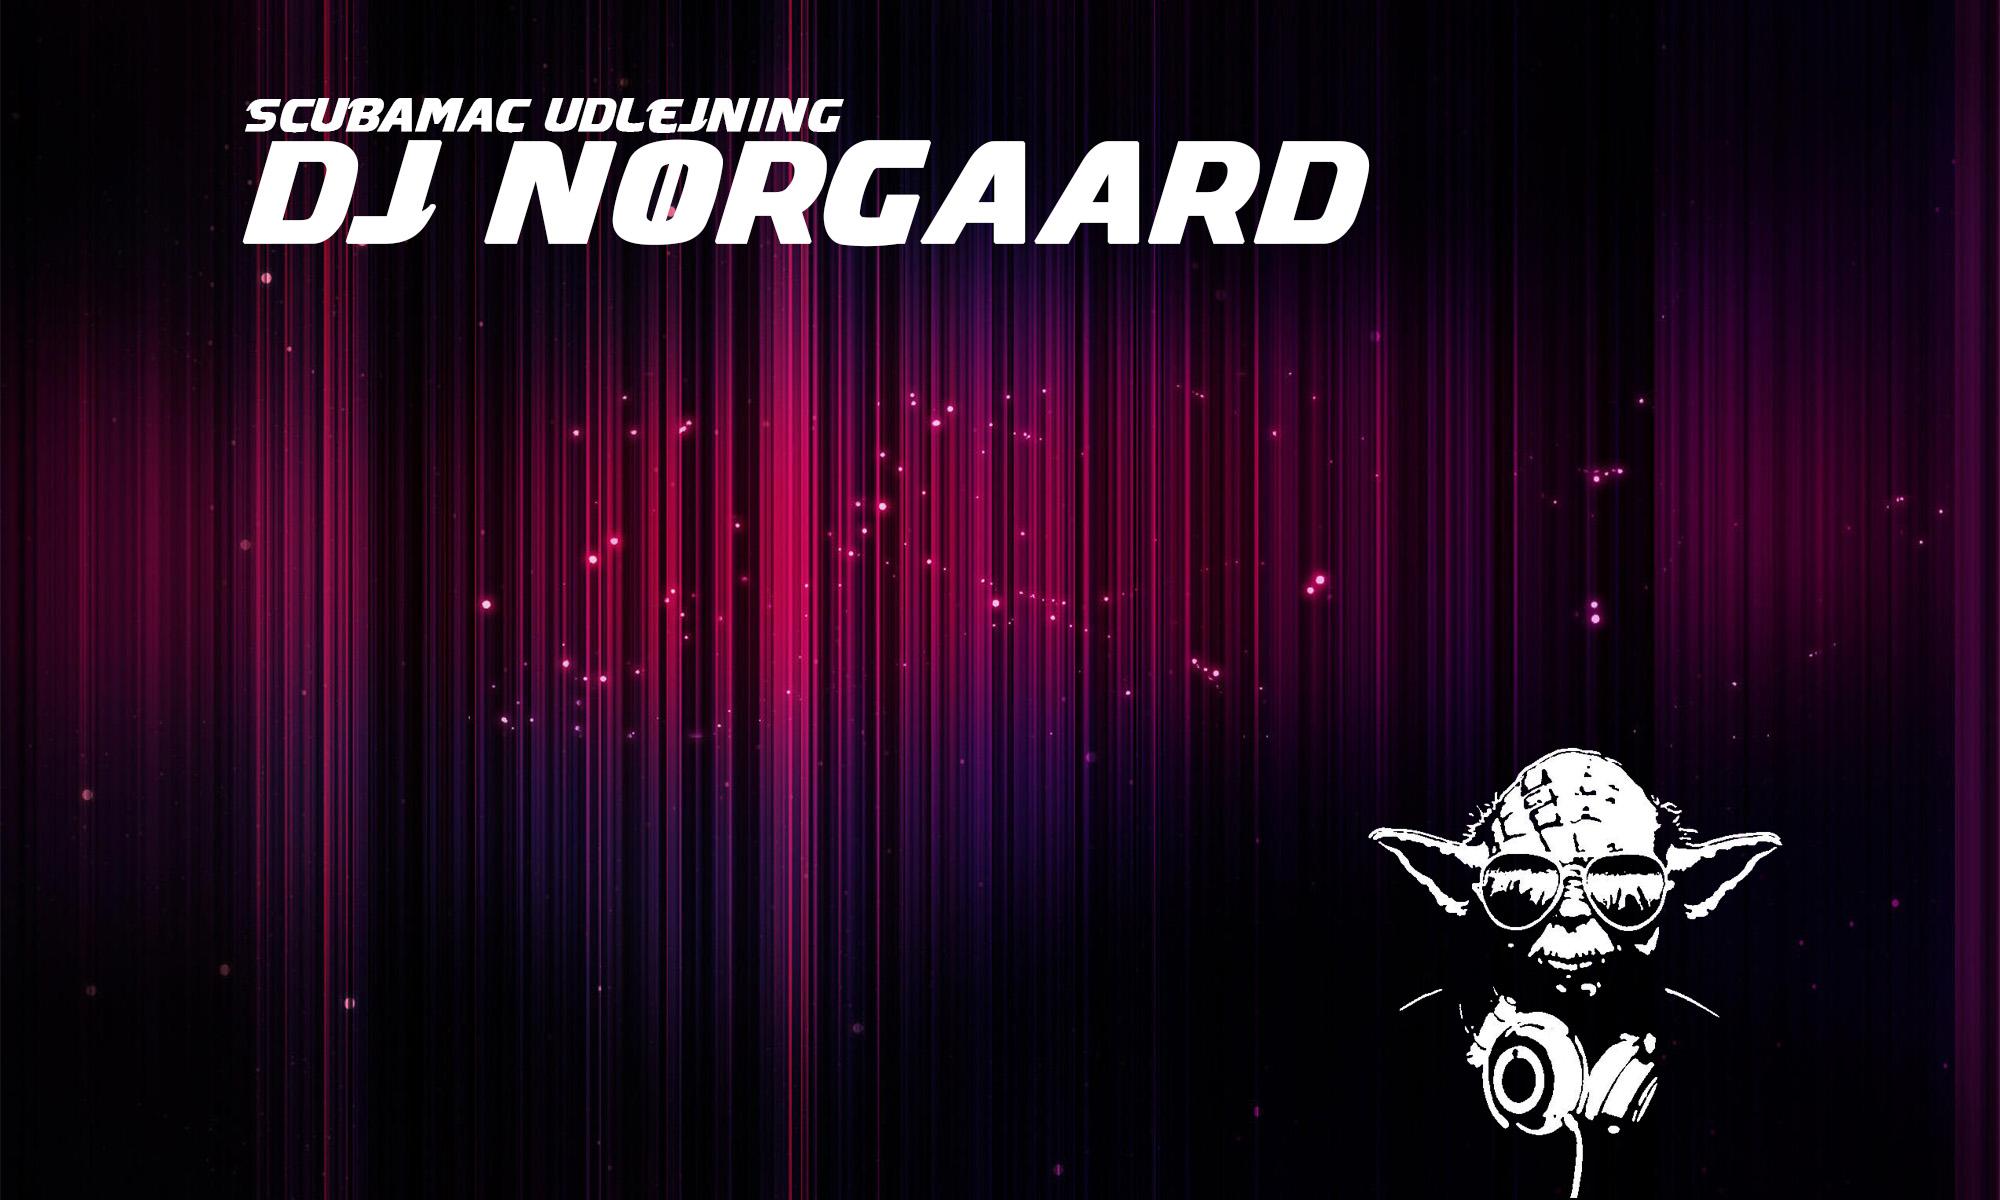 DJ Nørgaard